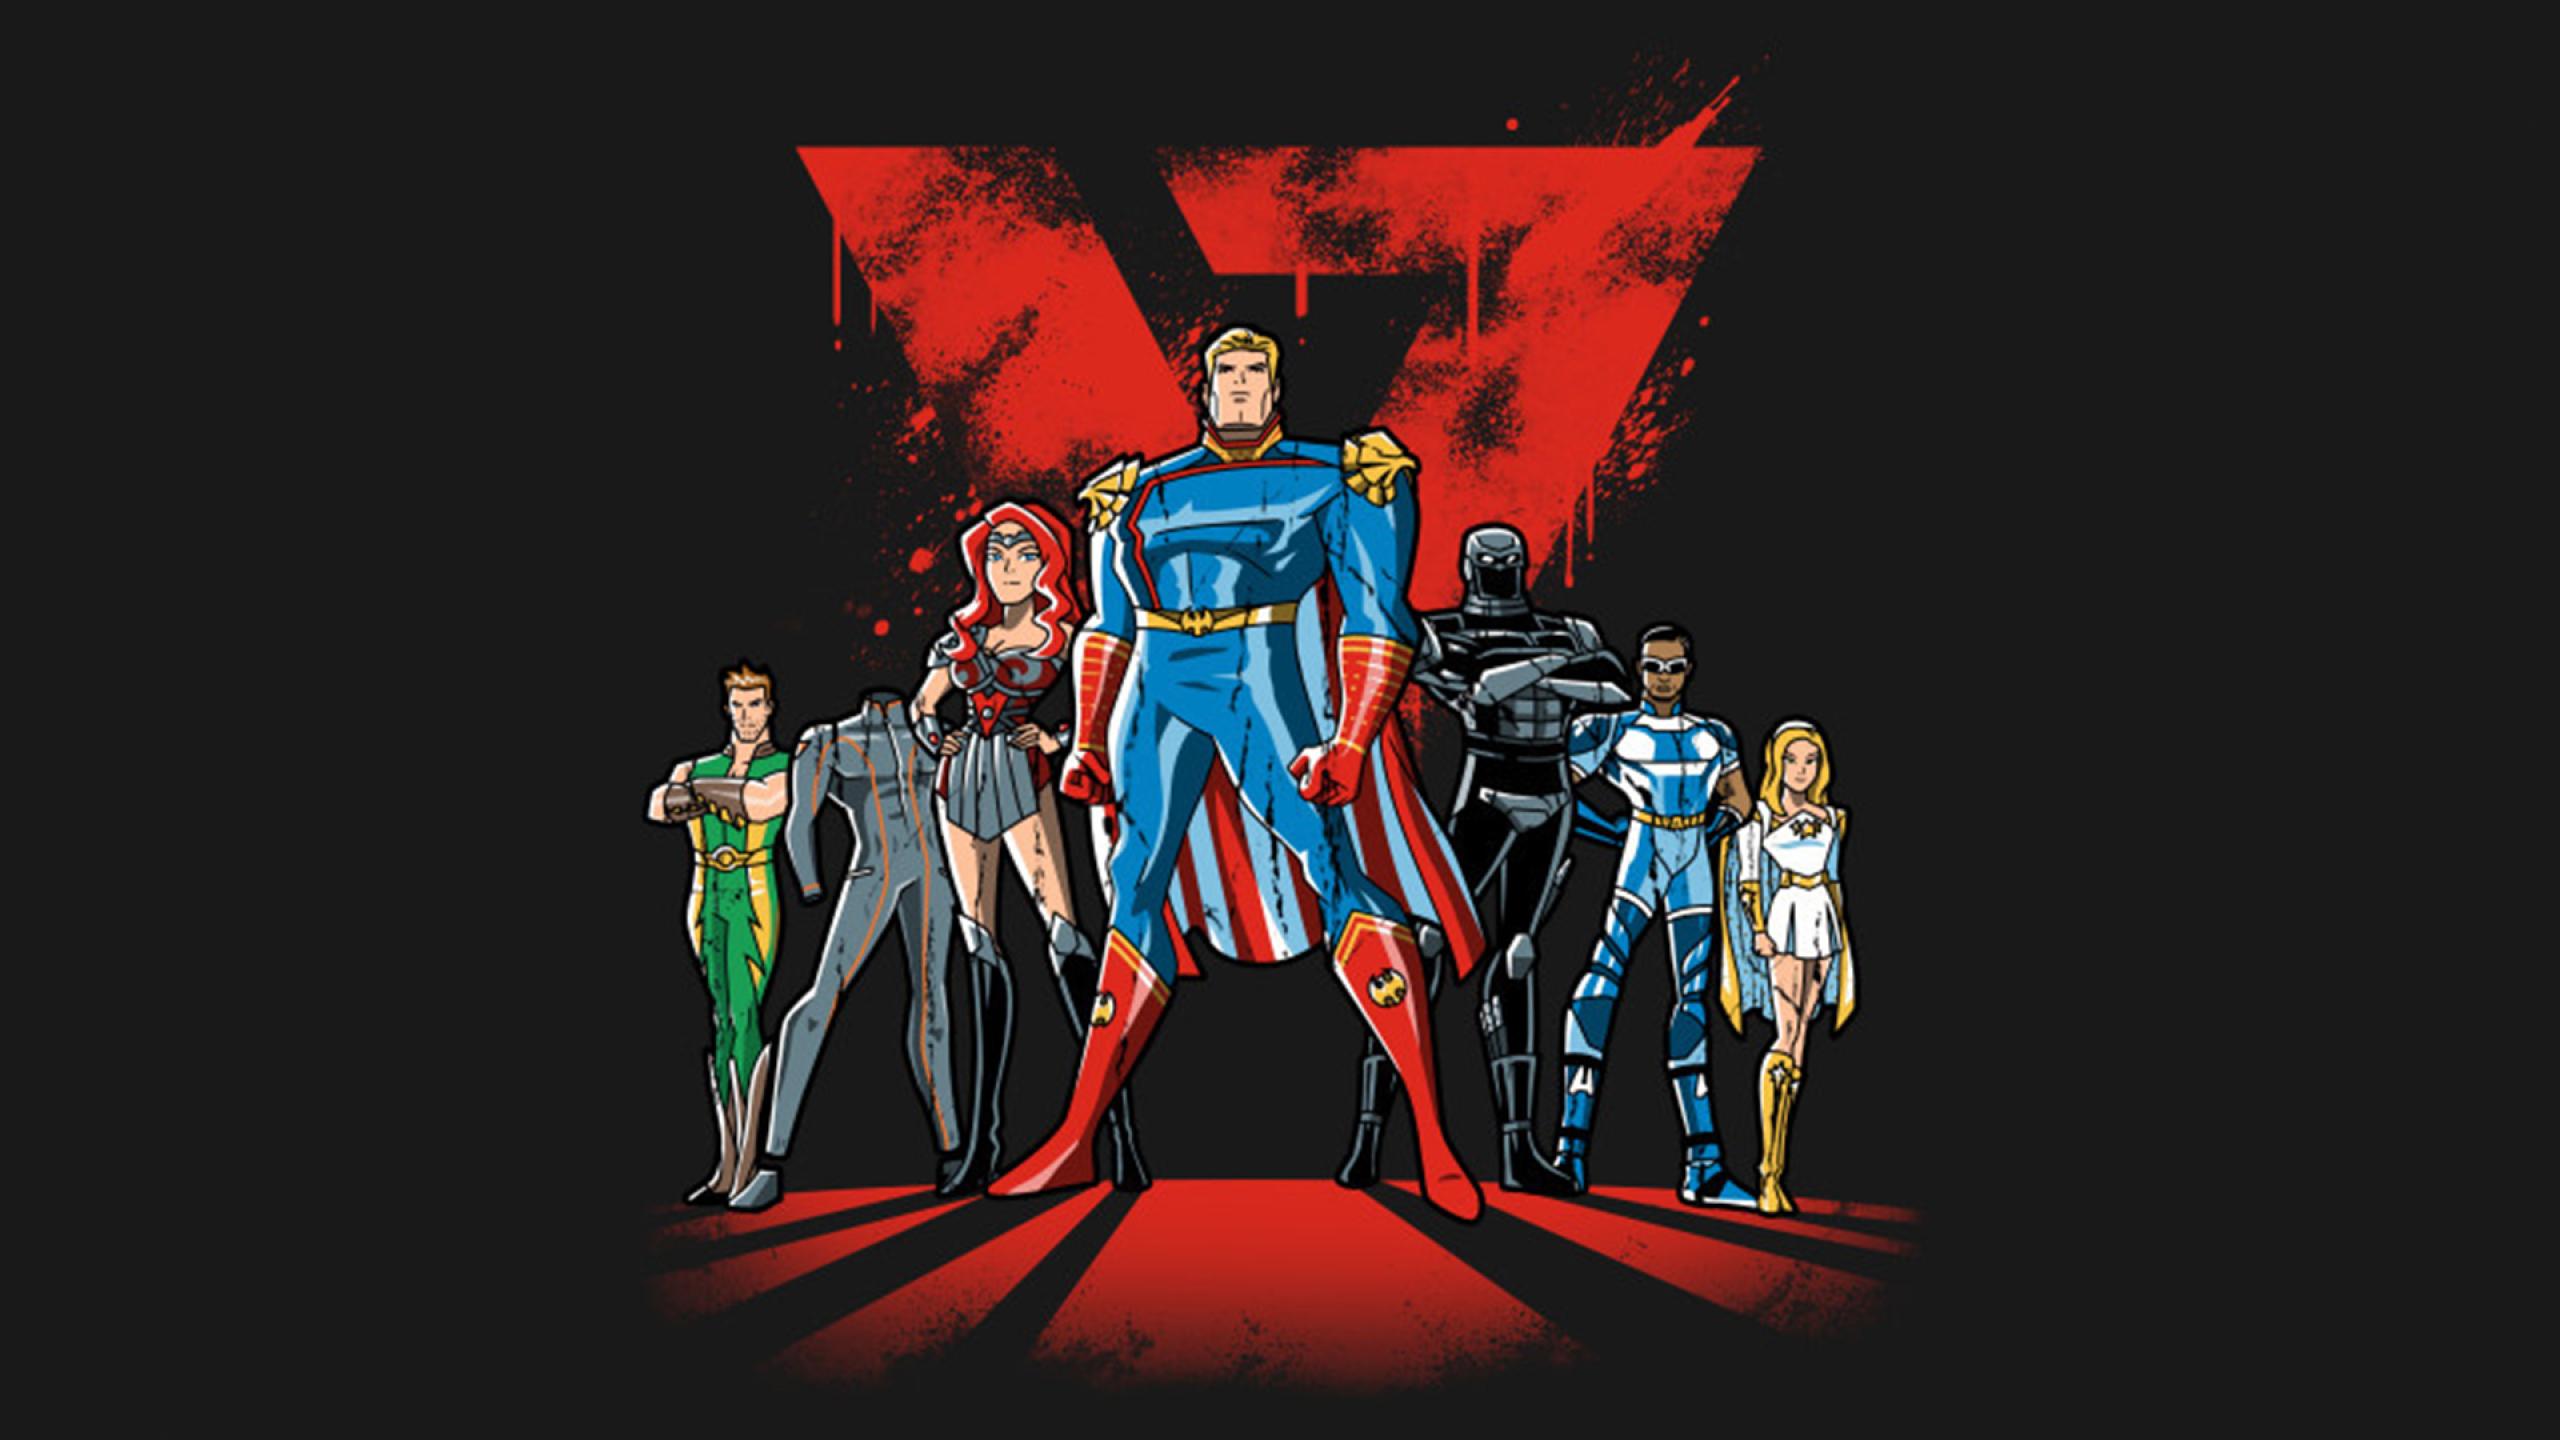 2560x1440 The Boys Superheroes 1440p Resolution Wallpaper